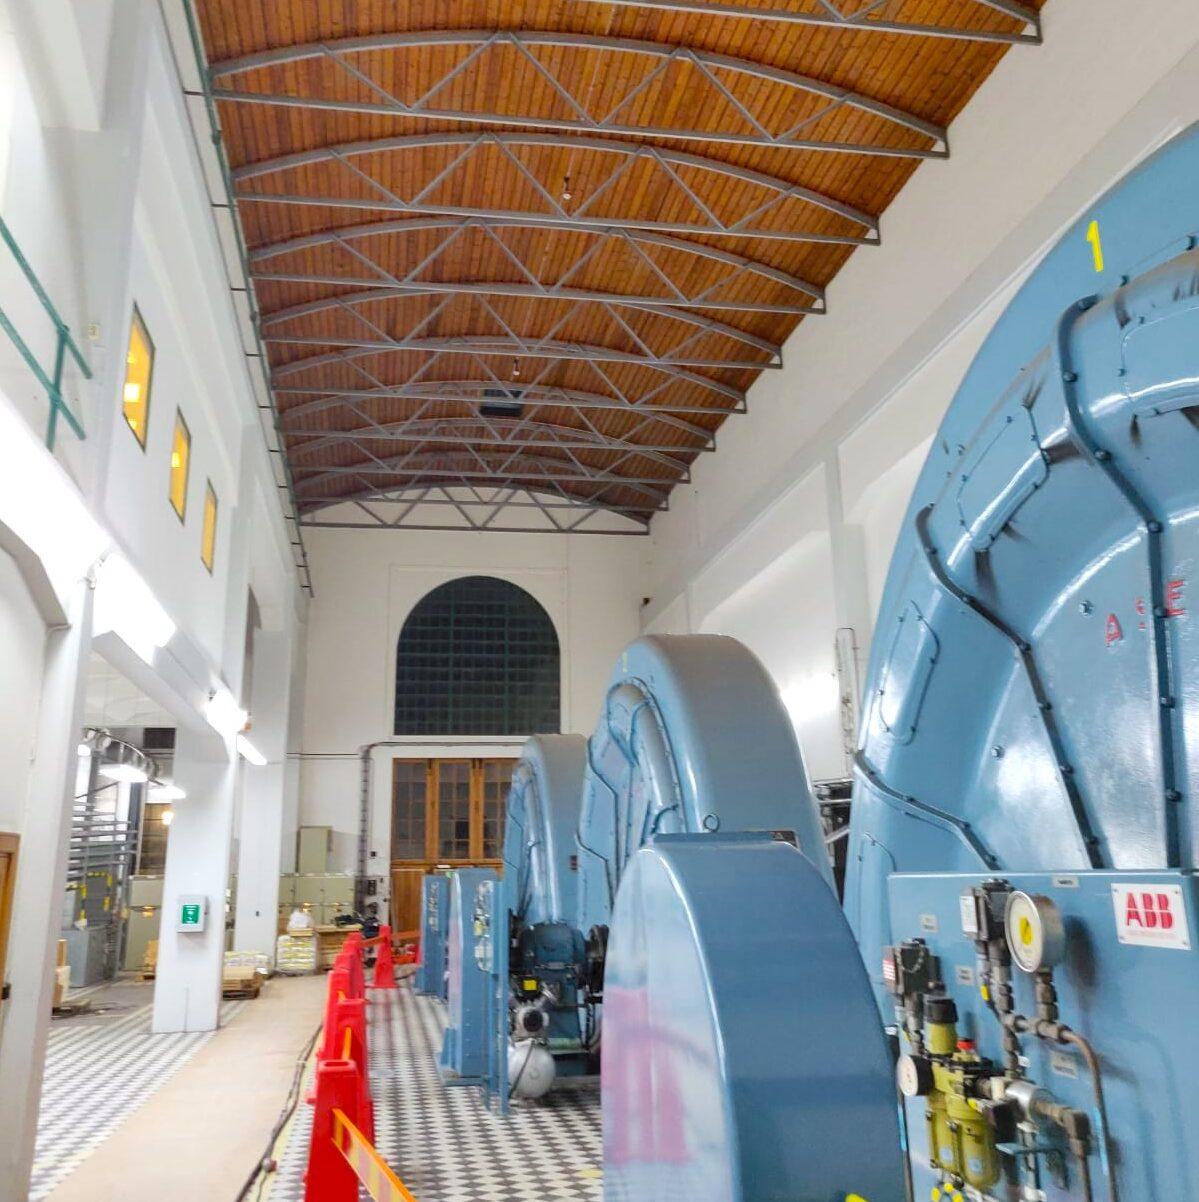 komsol Innerseal Kraftwerke Atomkraftwerke Kohlekraftwerke Wasserkraftwerke Beton versiegeln oekologisch ungiftig dauerhaft geld sparen blog historisch